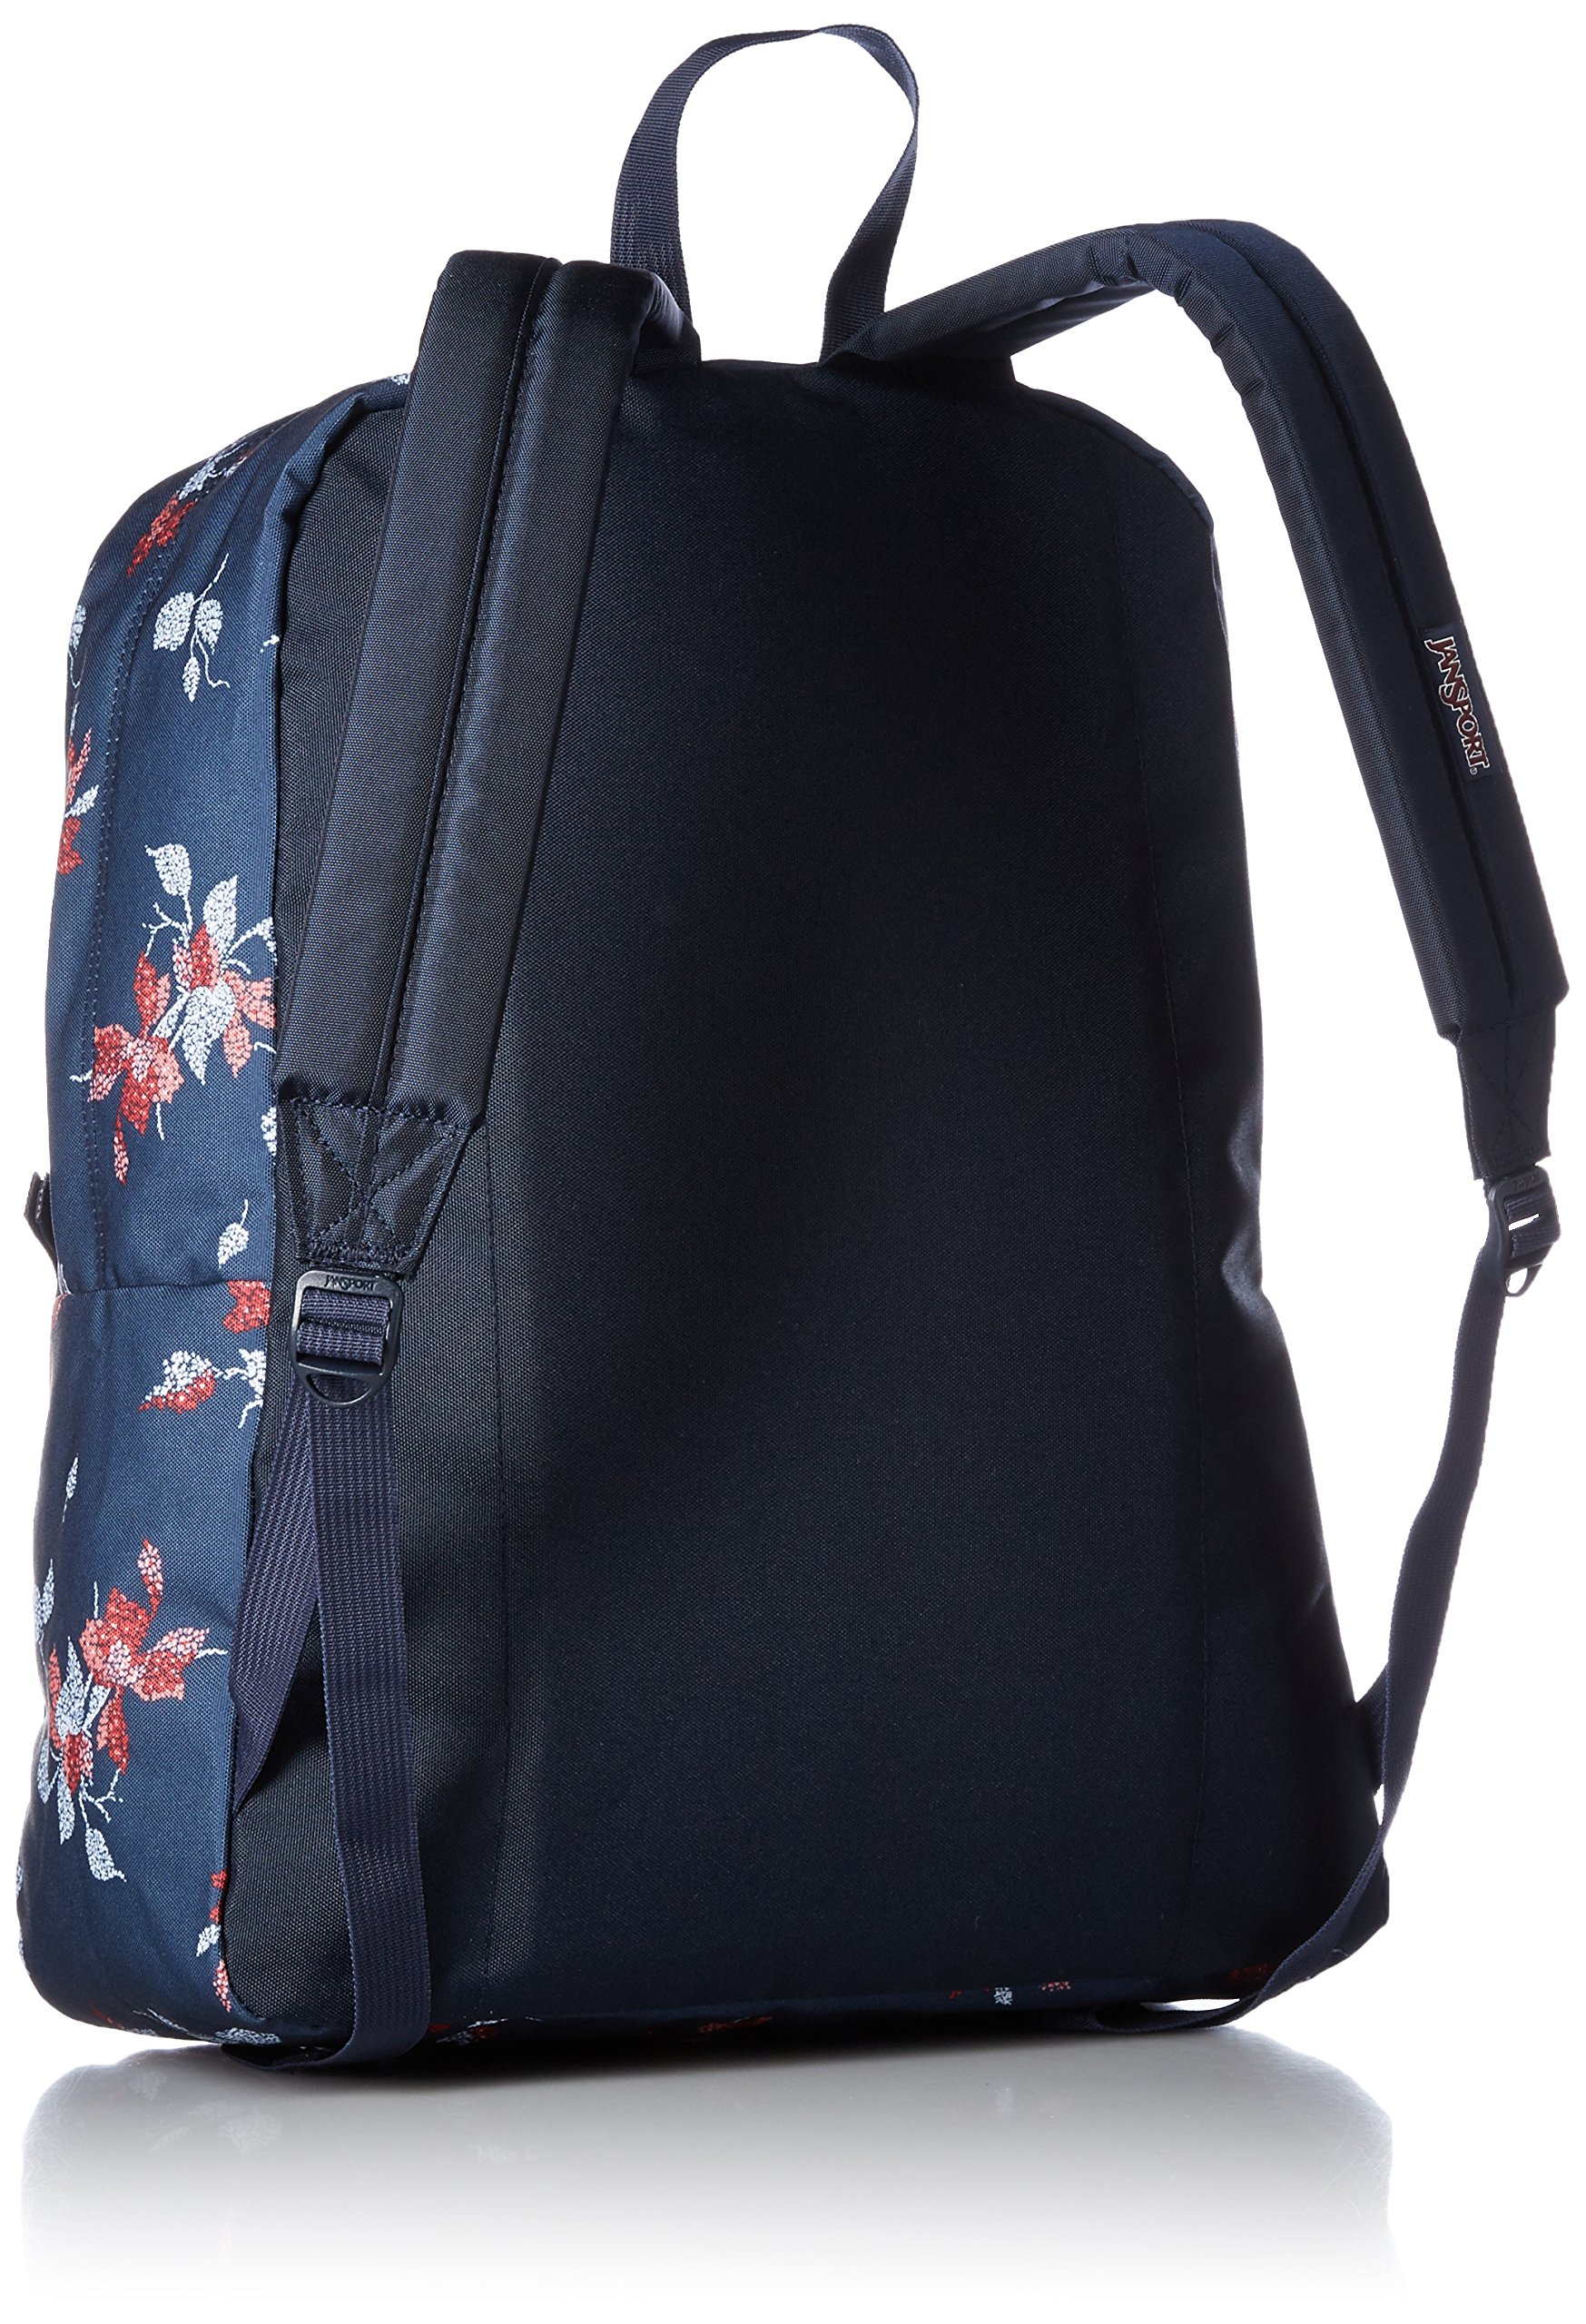 JanSport Unisex SuperBreak Navy Sweet Blossom Backpack